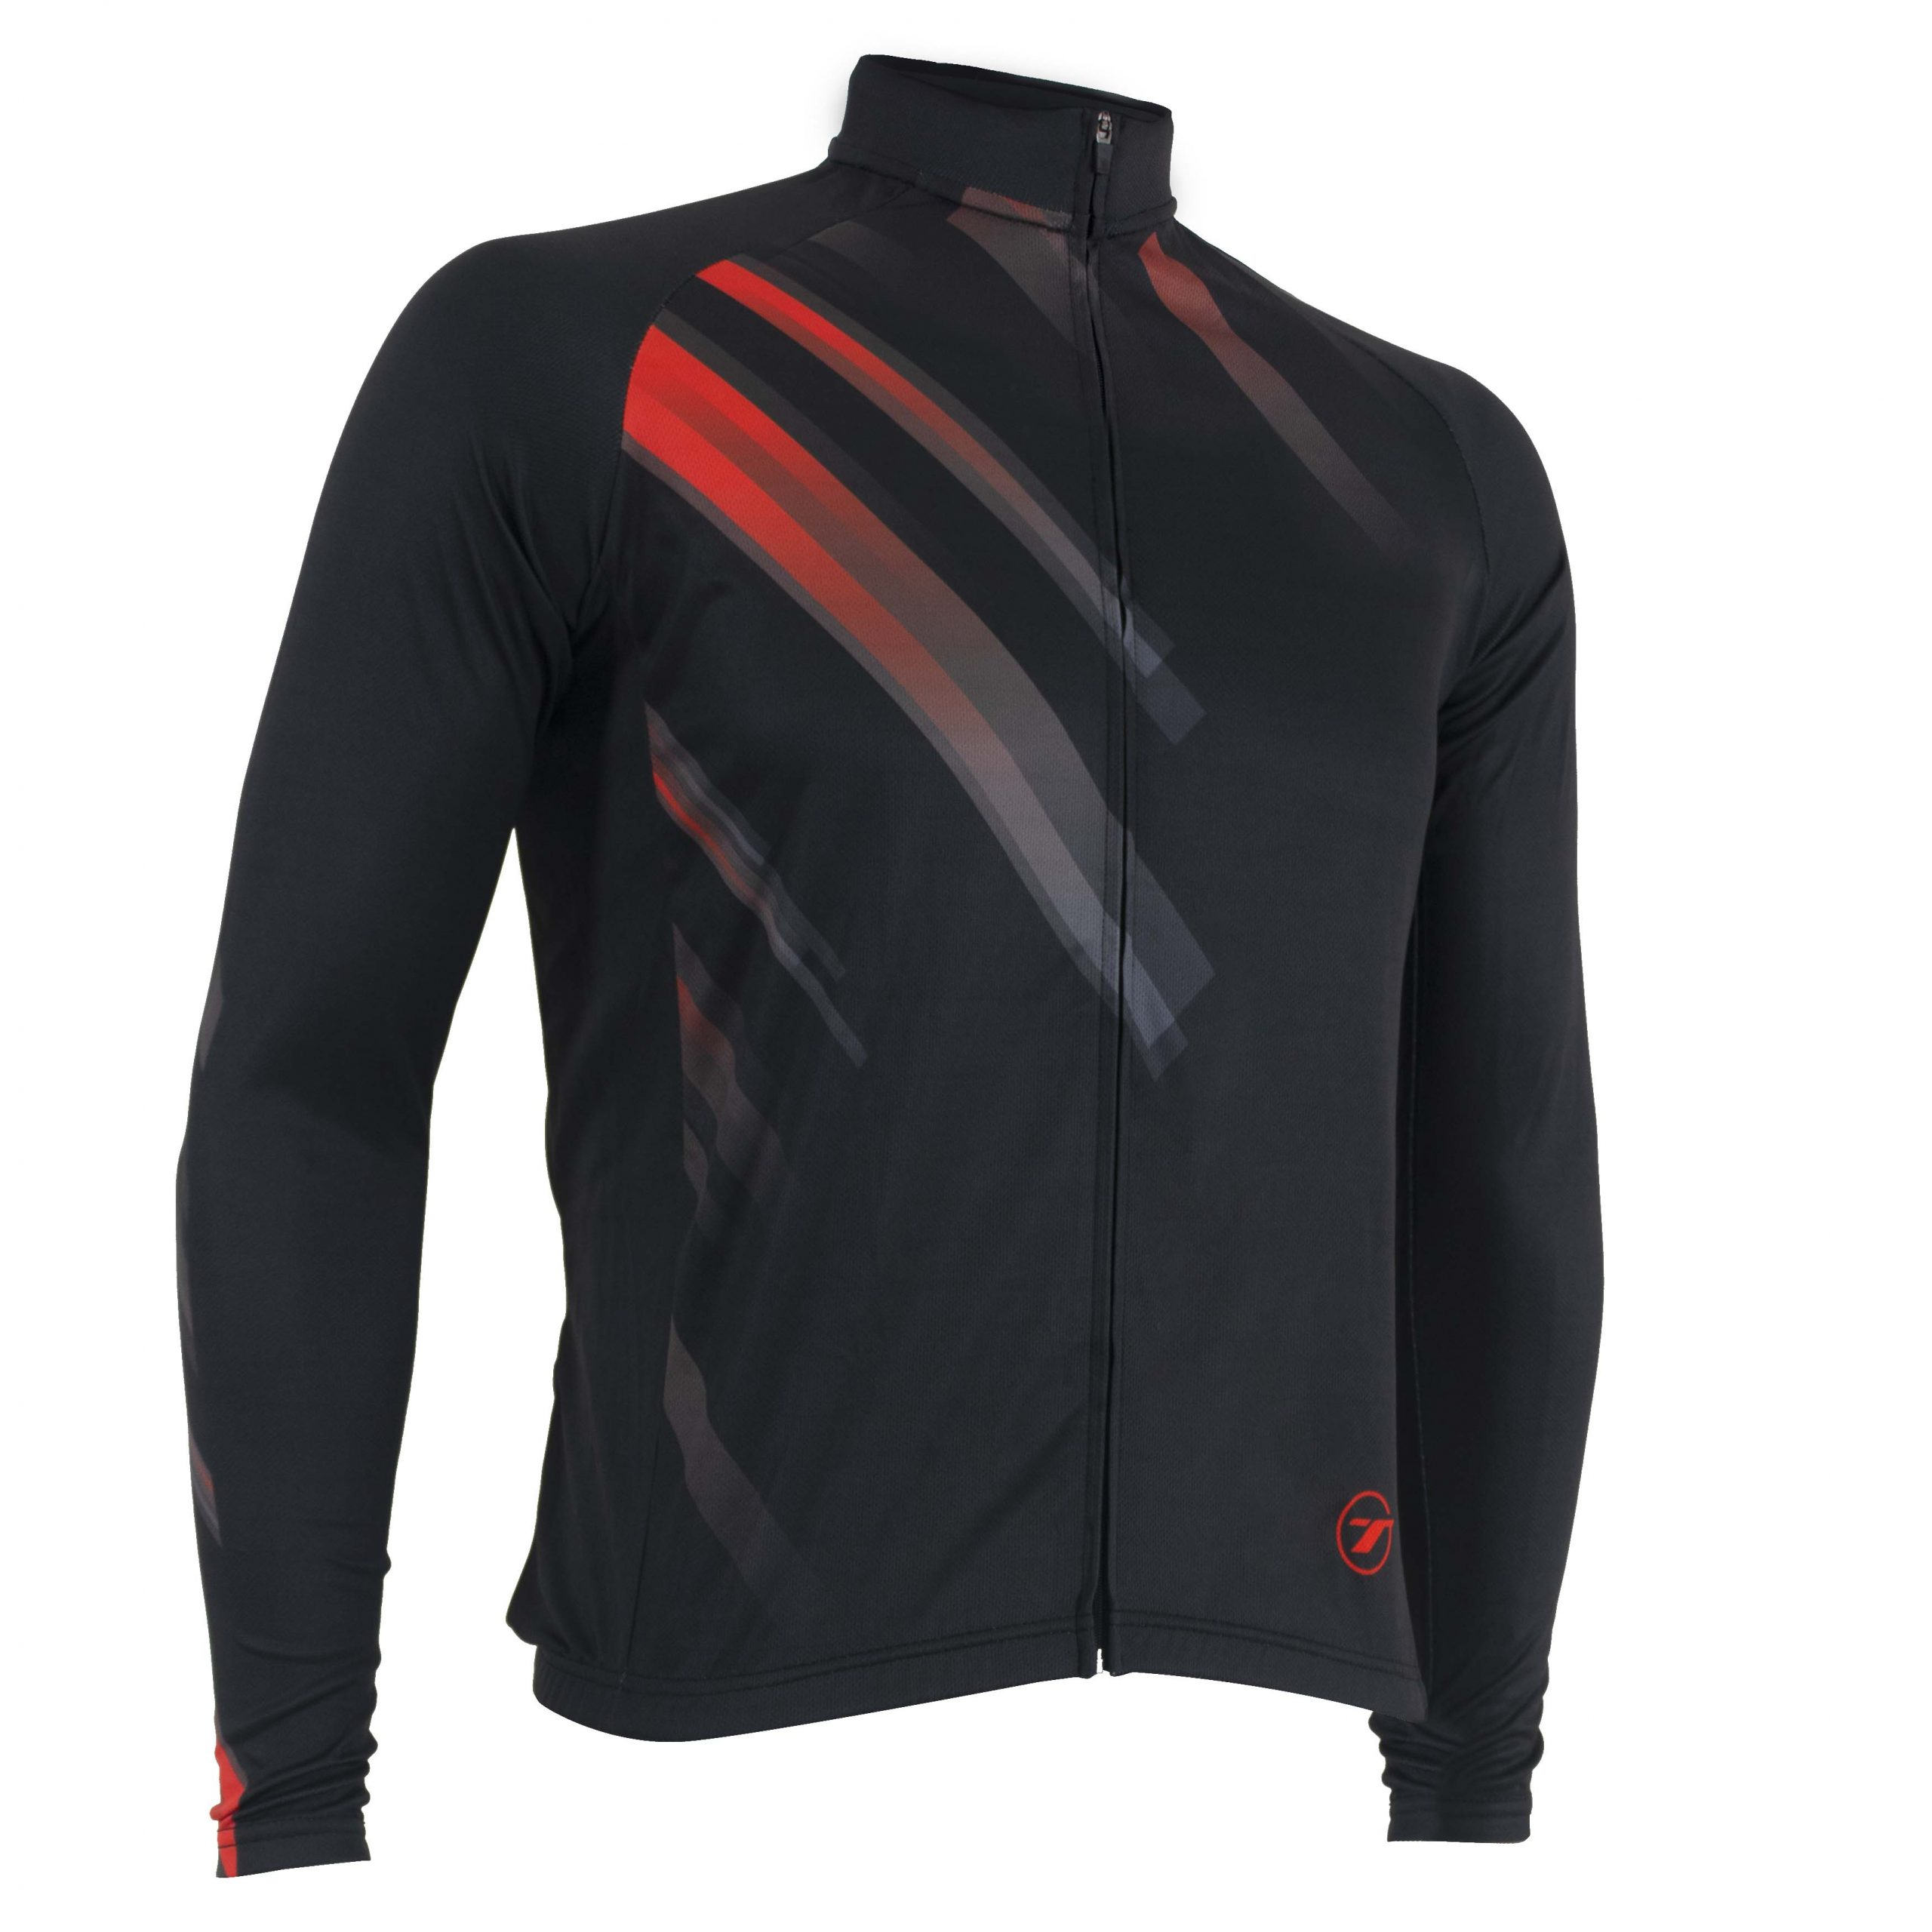 Camisa manga longa para ciclismo SUNNY | RIDE LINE 4